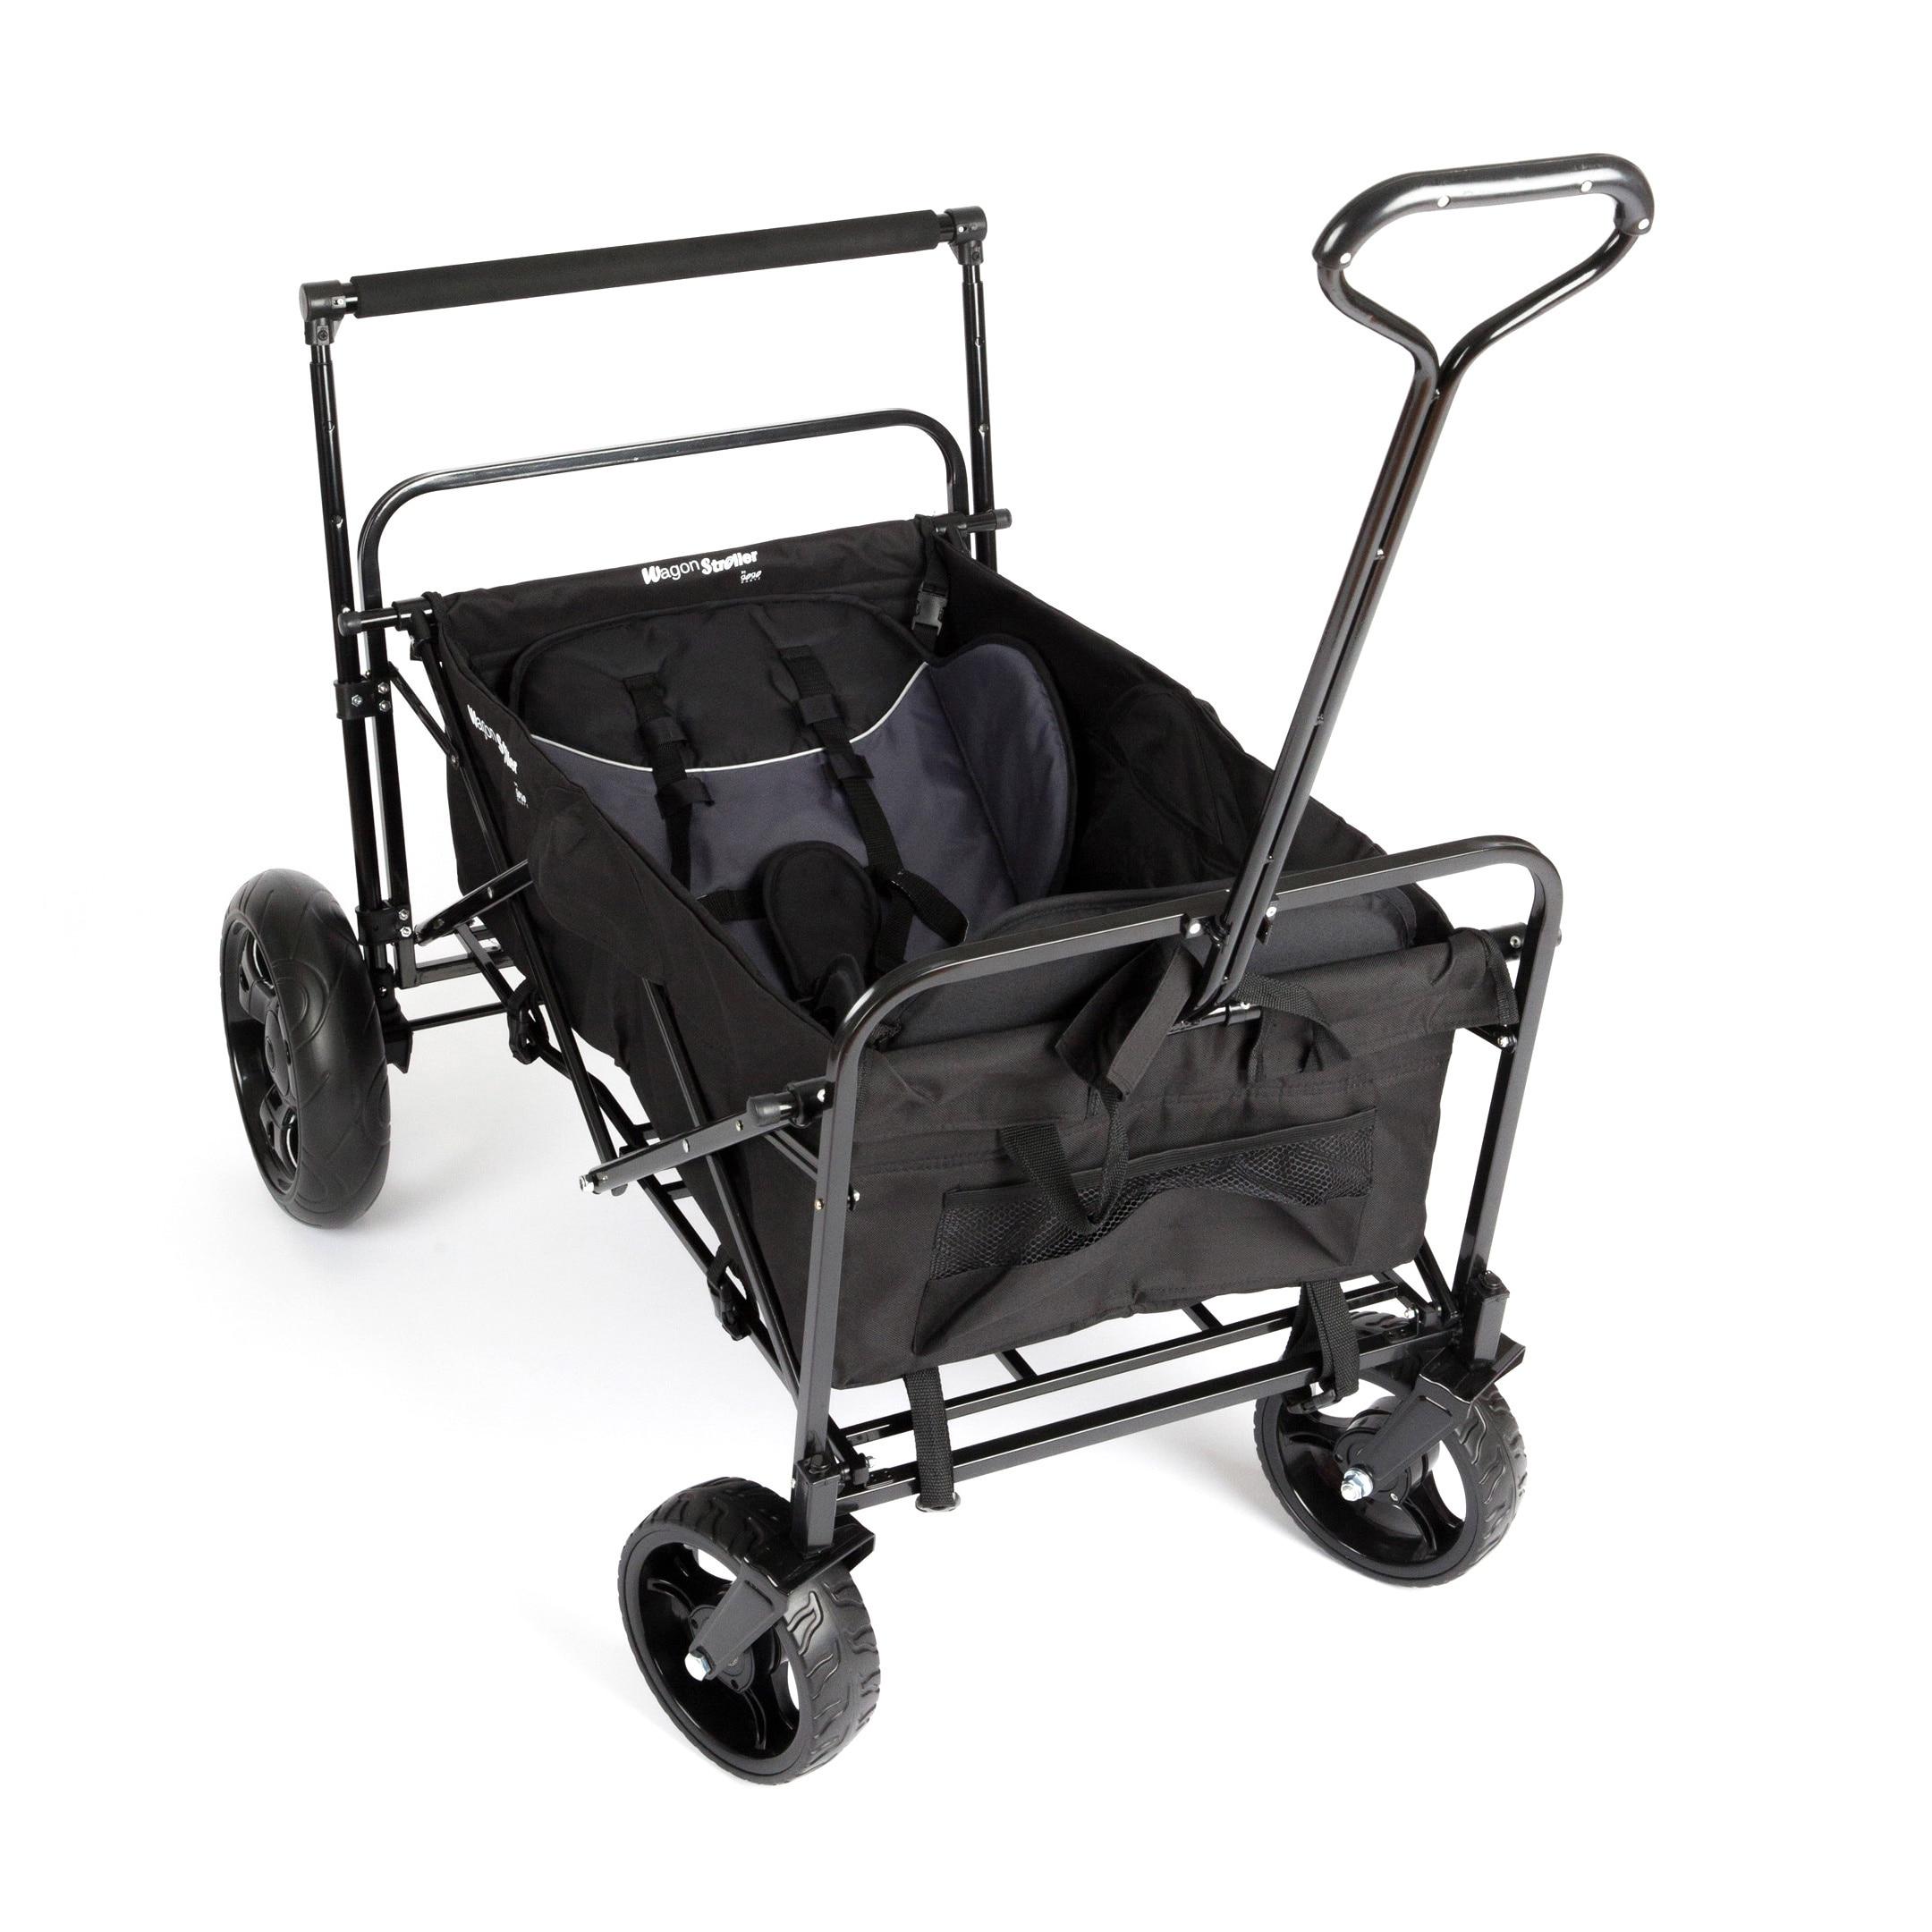 Go-Go Babyz Wagon Stroller Cart at Sears.com